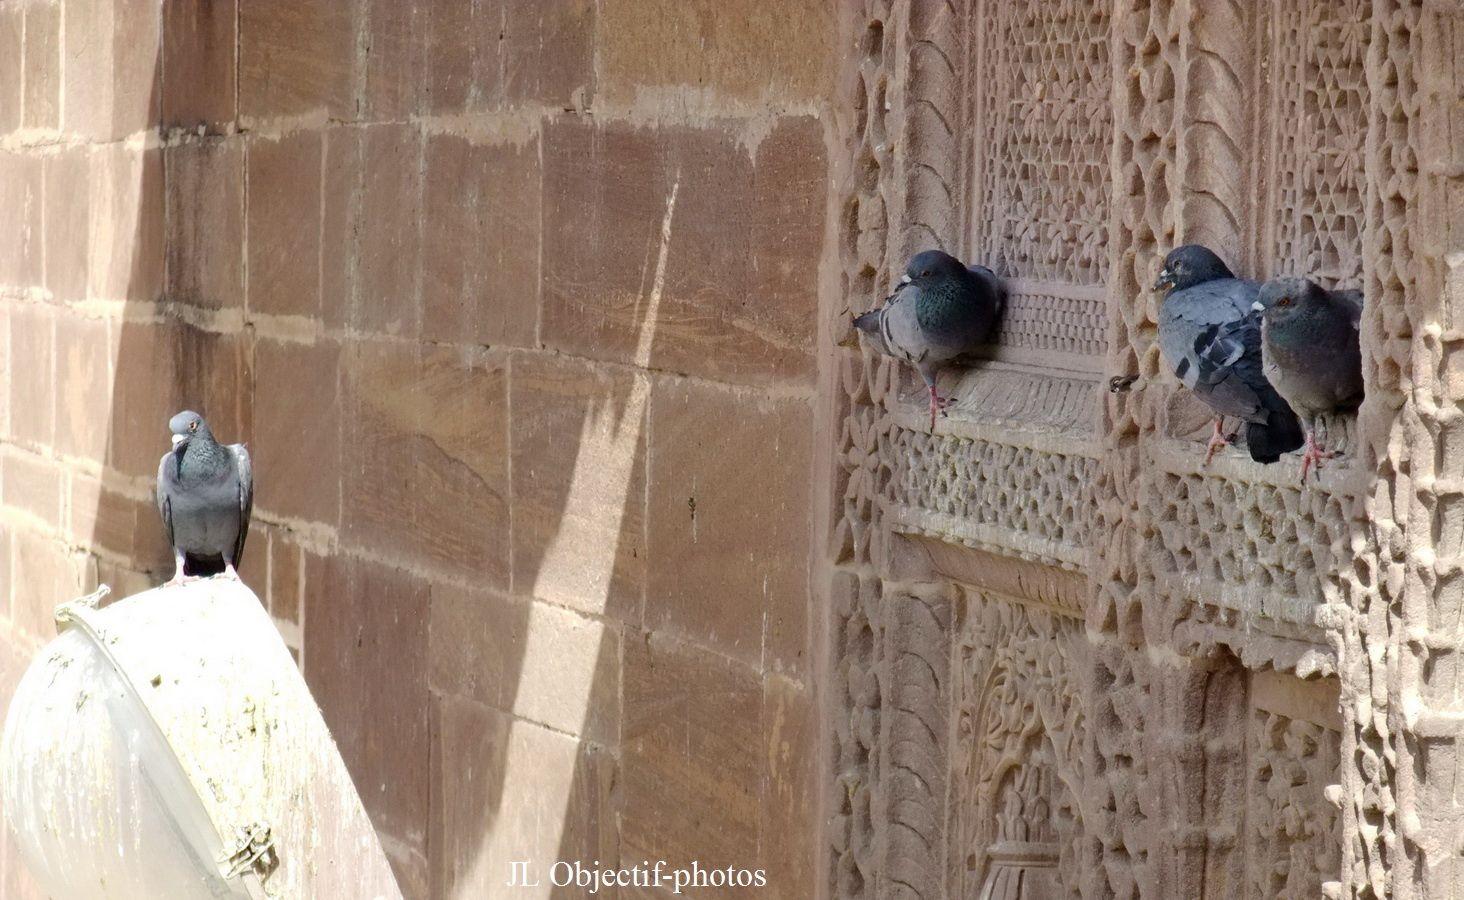 Mehrangarh Fort Jodhpur Rajasthan India. Fort Mehrangarh Jodhpur Rajasthan Inde